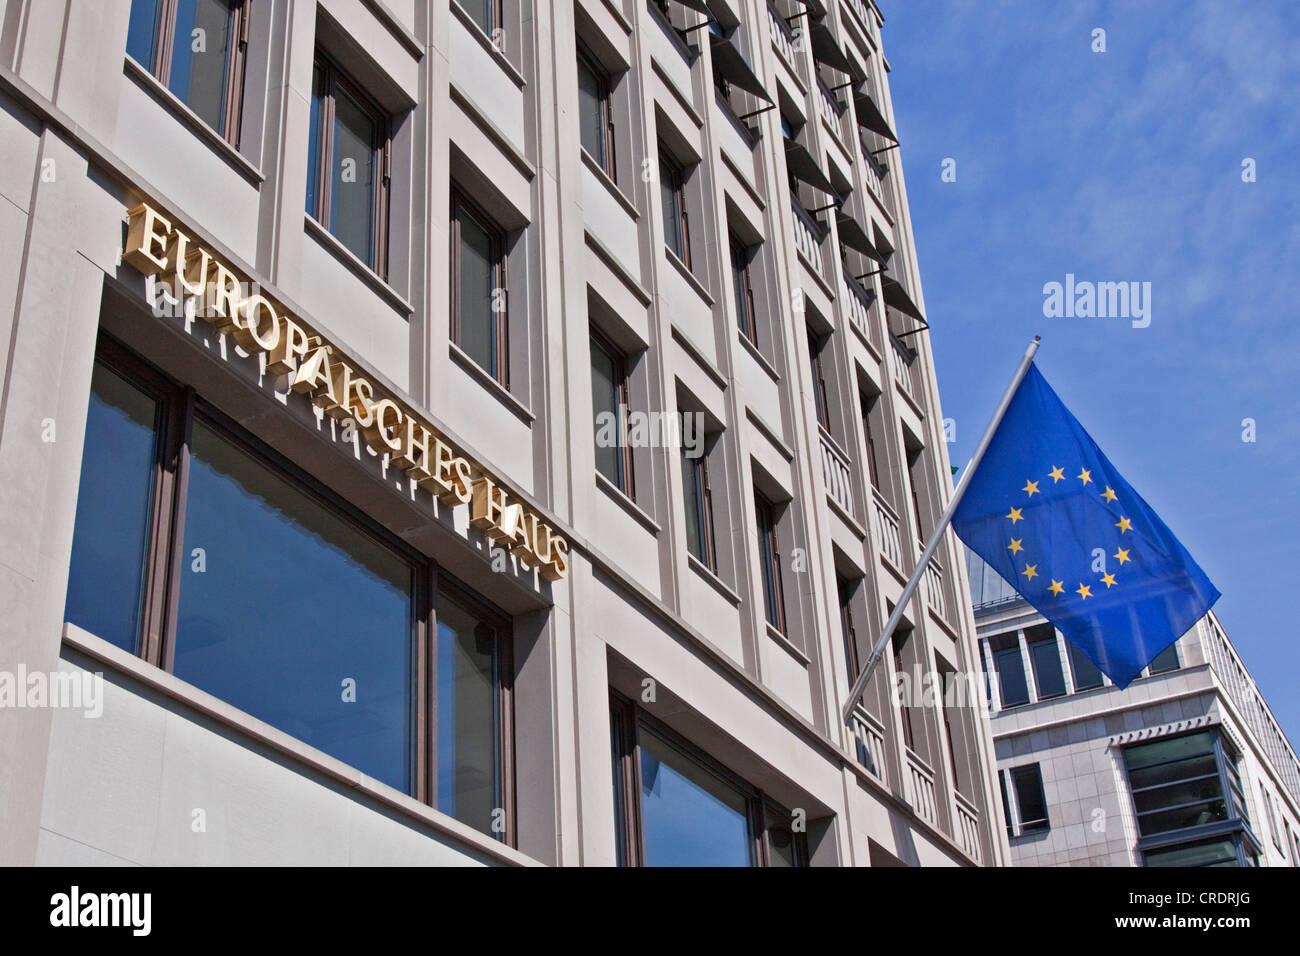 European House Berlin, information office of the European Parliament, European flag, at the Brandenburg Gate, Berlin - Stock Image